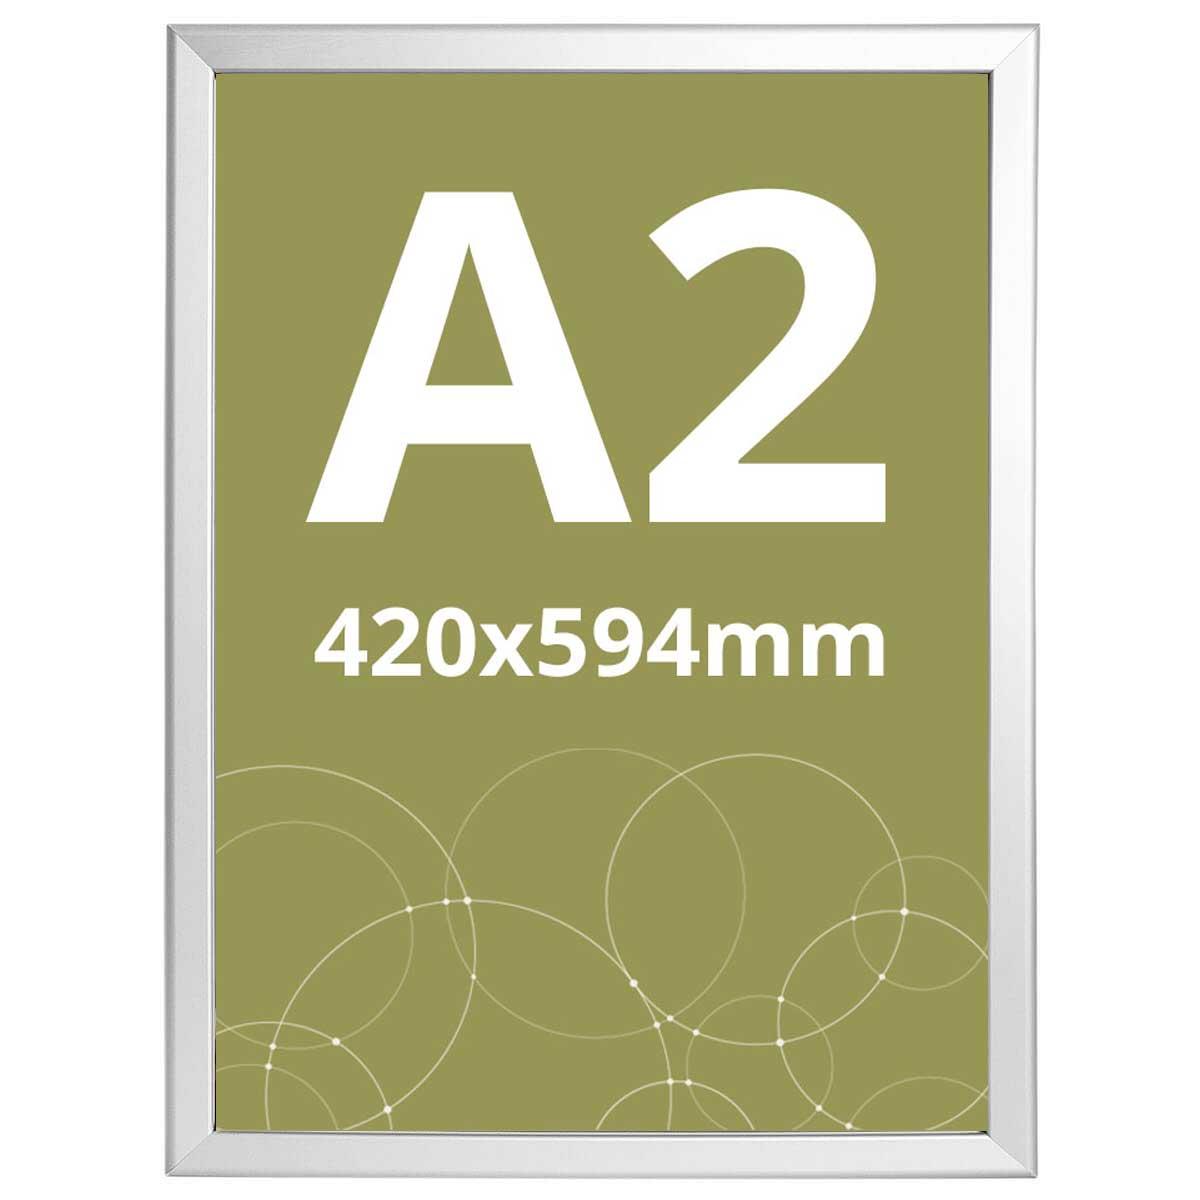 Ramă click Poster Frame din aluminiu 32, colțuri drepte A2, JJ DISPLAYS, 420 x 594 mm